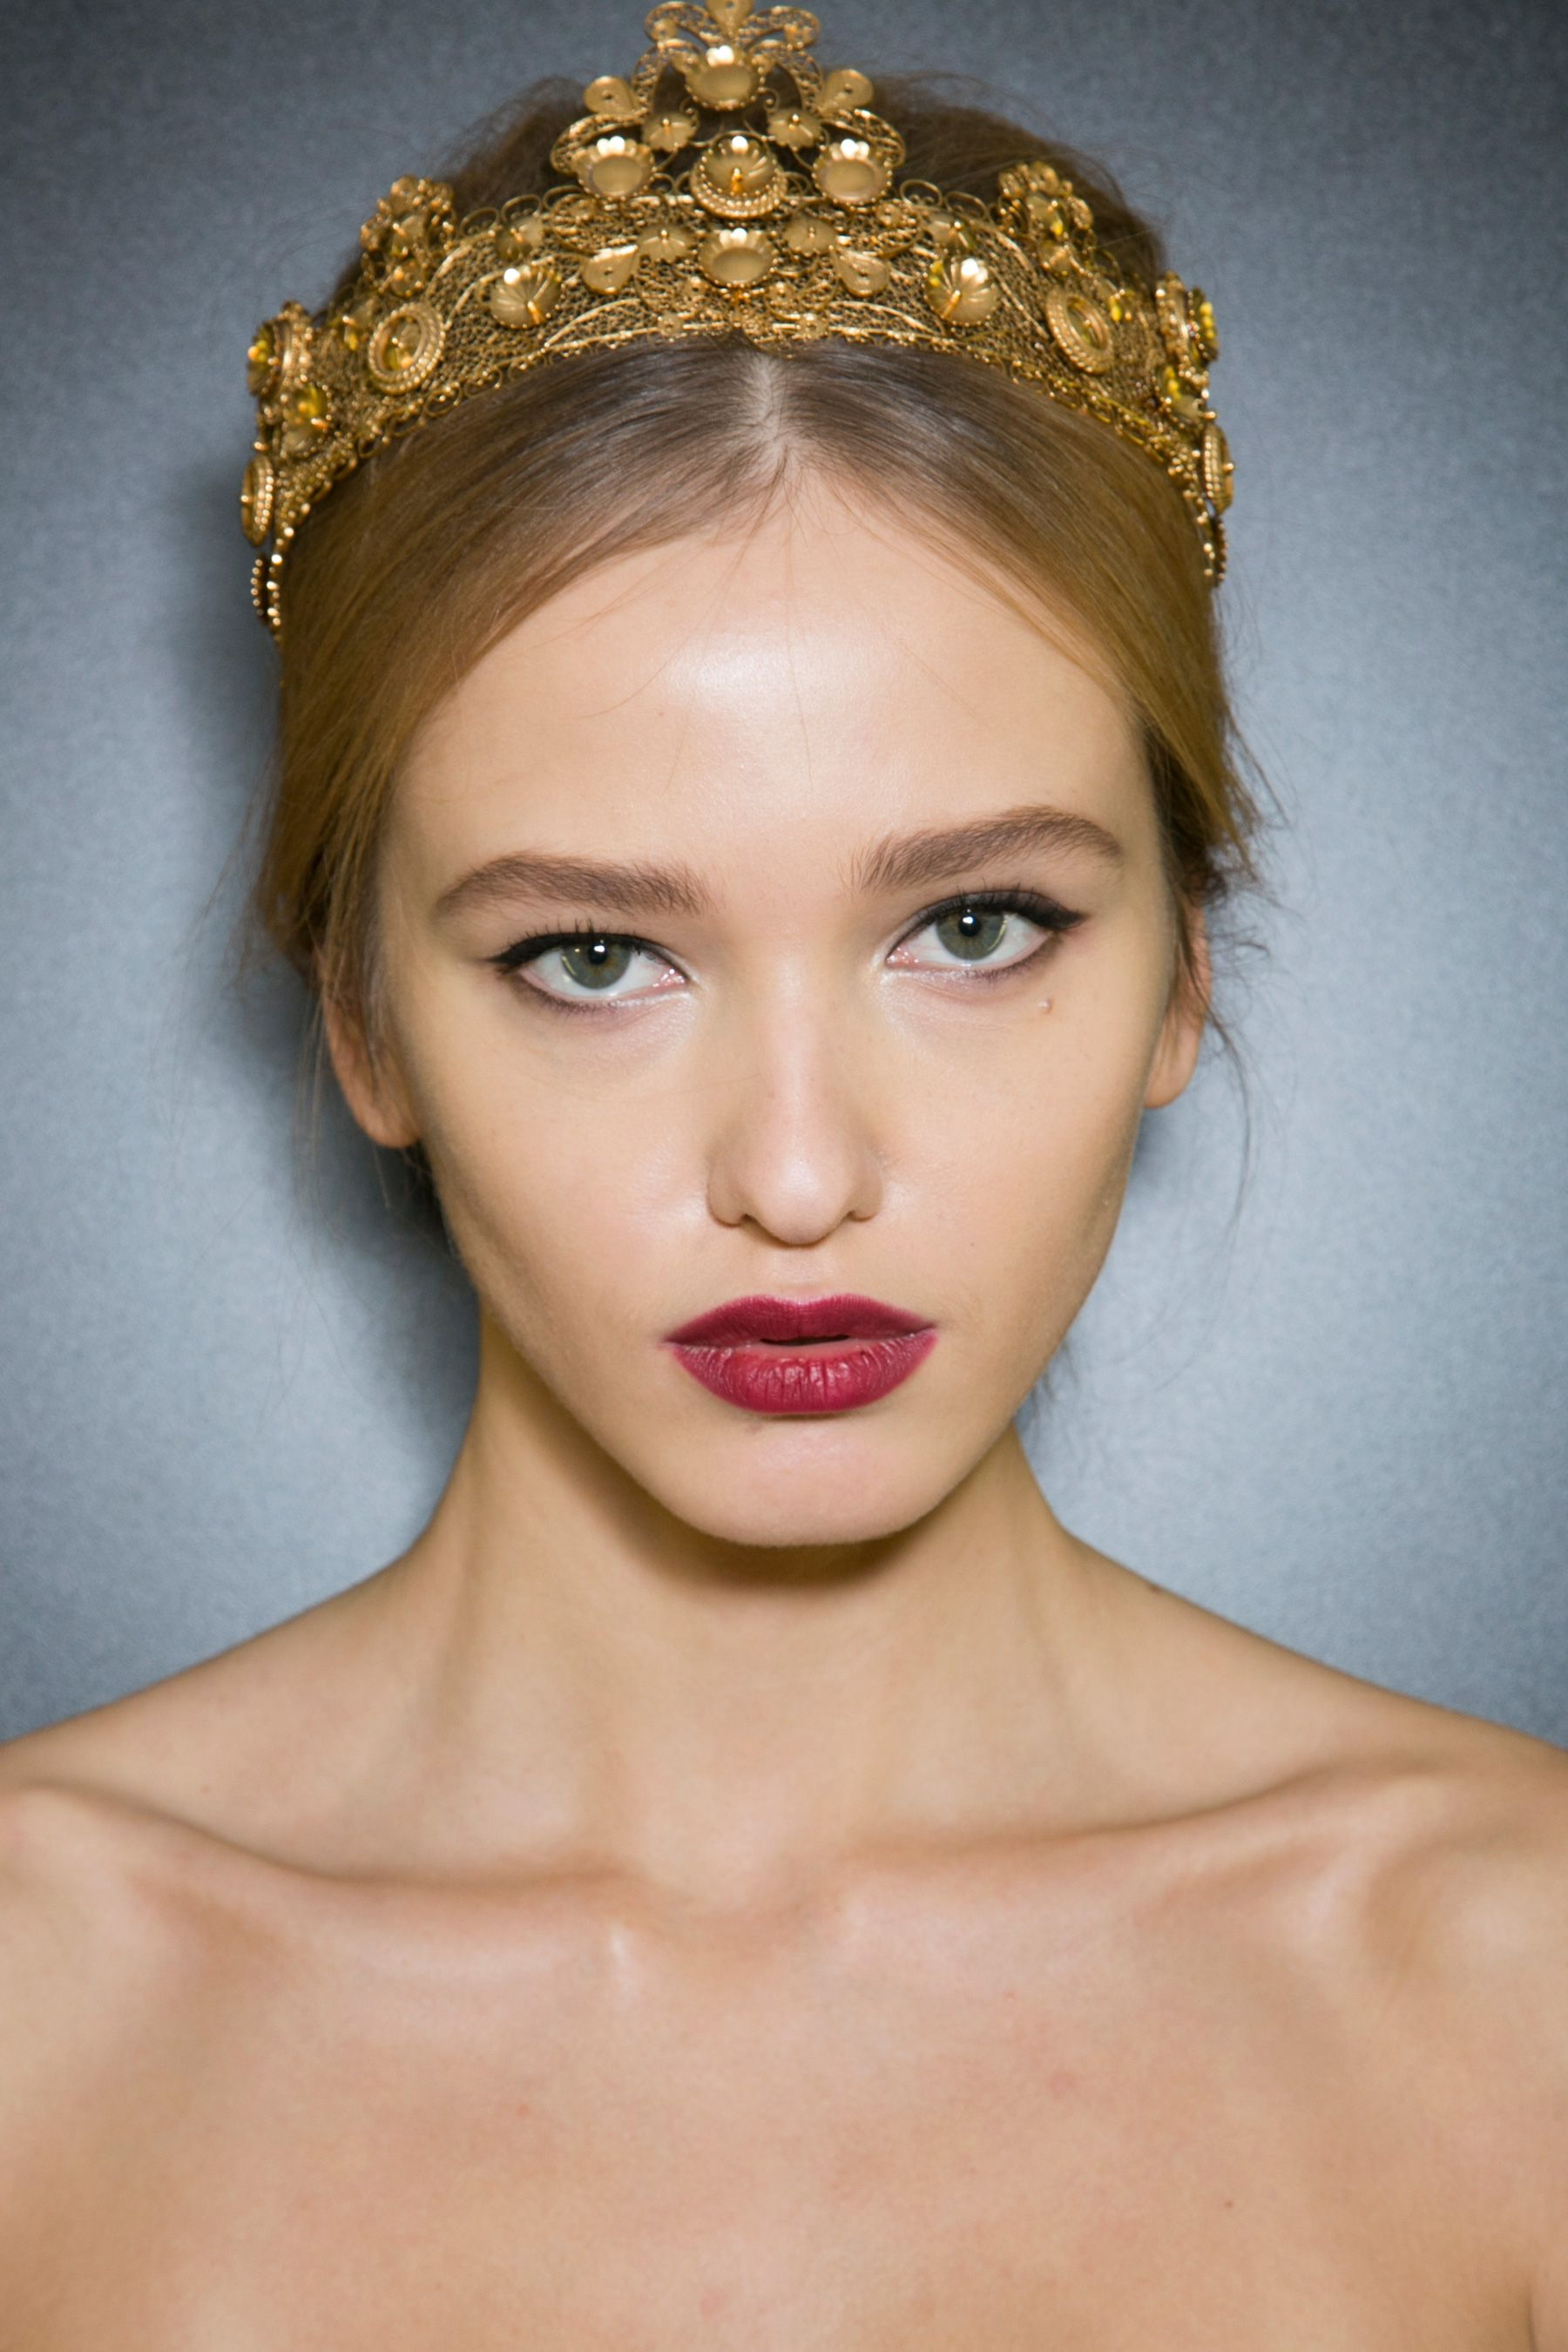 Dolce & Gabbana Beauty A/W '13 Beauty, Makeup, Beauty makeup